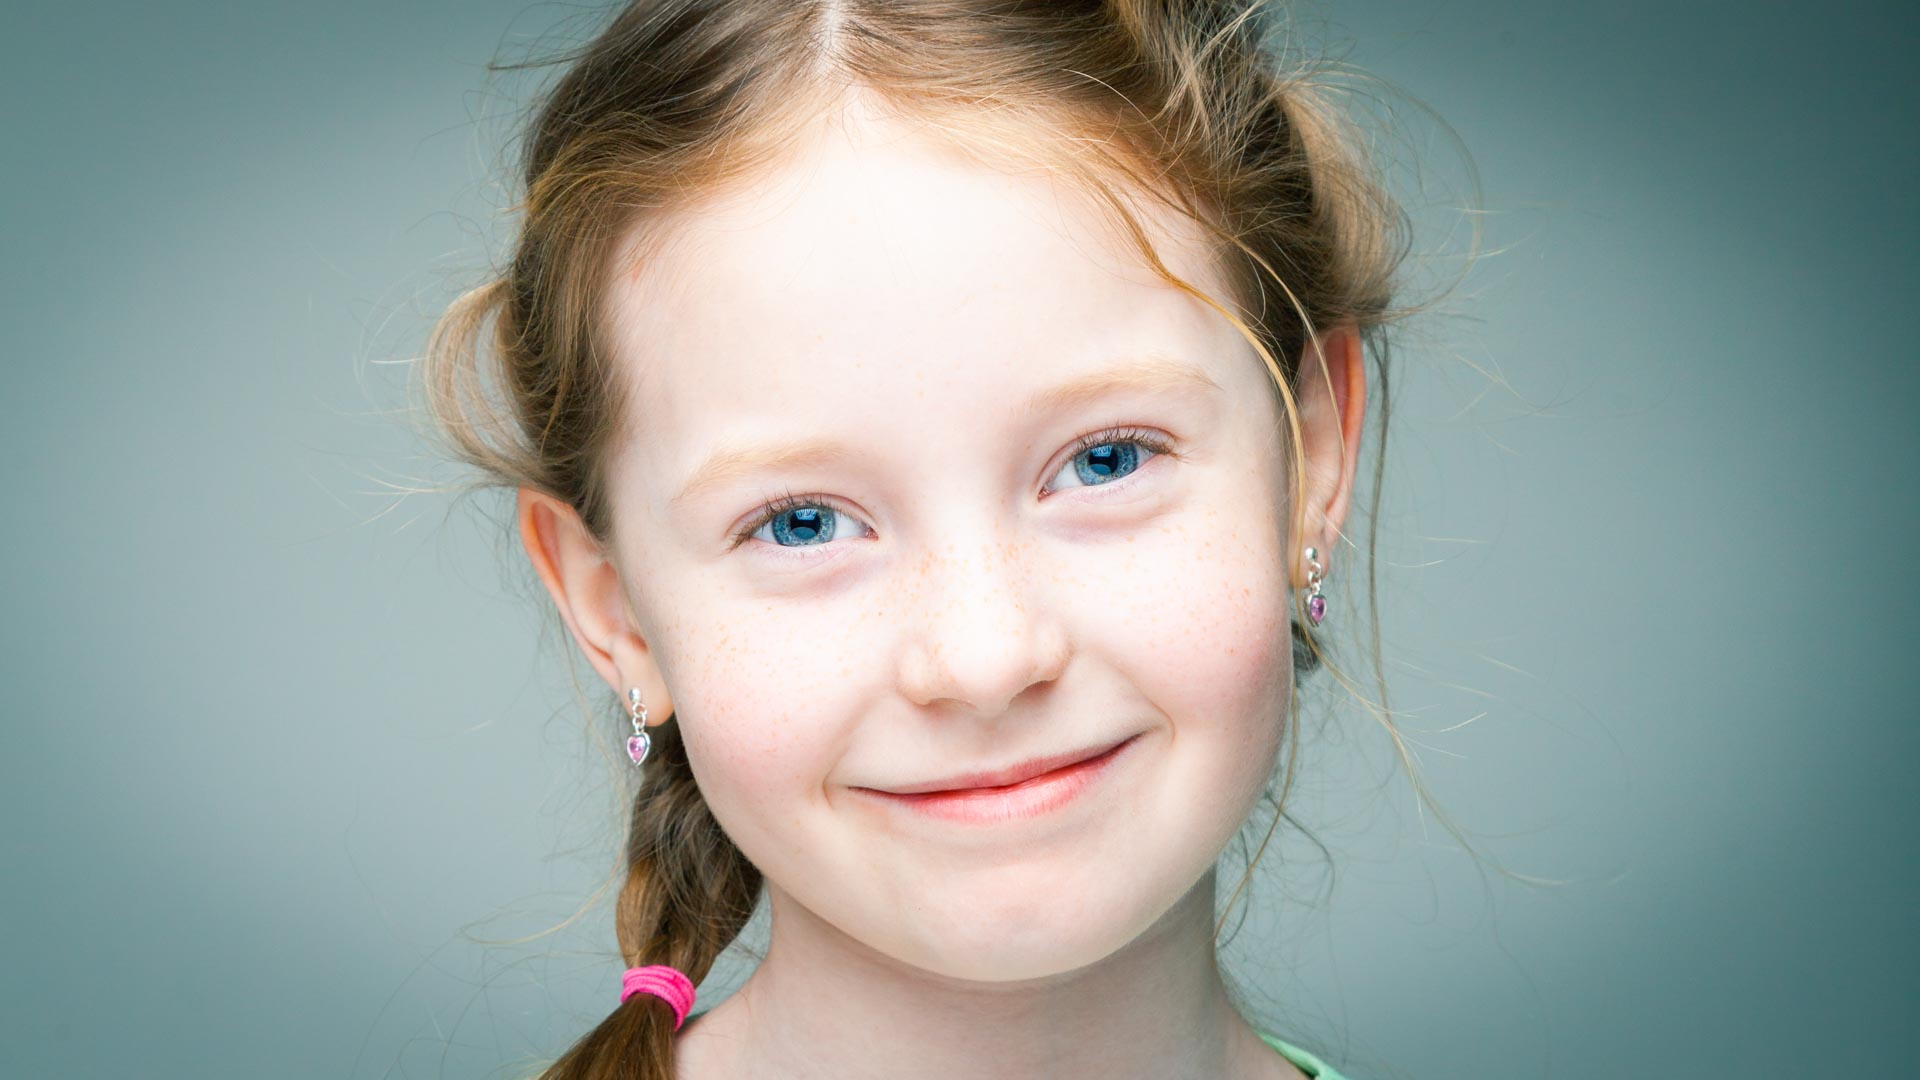 Barnefotografering portrettfoto studiofotografering Sandefjord